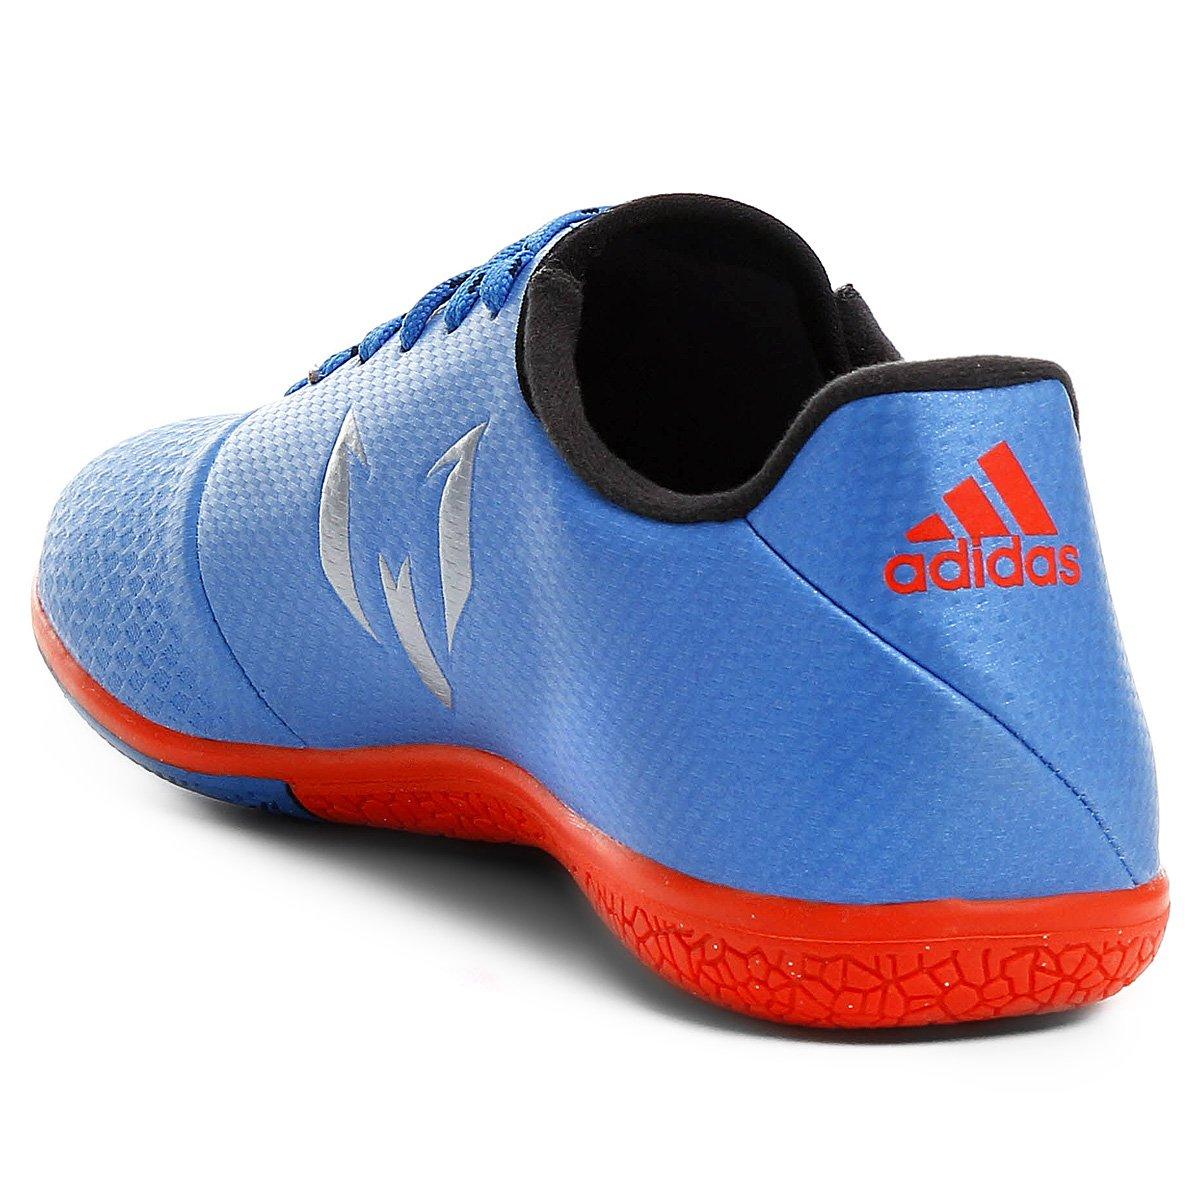 6832b2fe88 Chuteira Futsal Adidas Messi 16.3 IN - Azul e Prata - Compre Agora ...